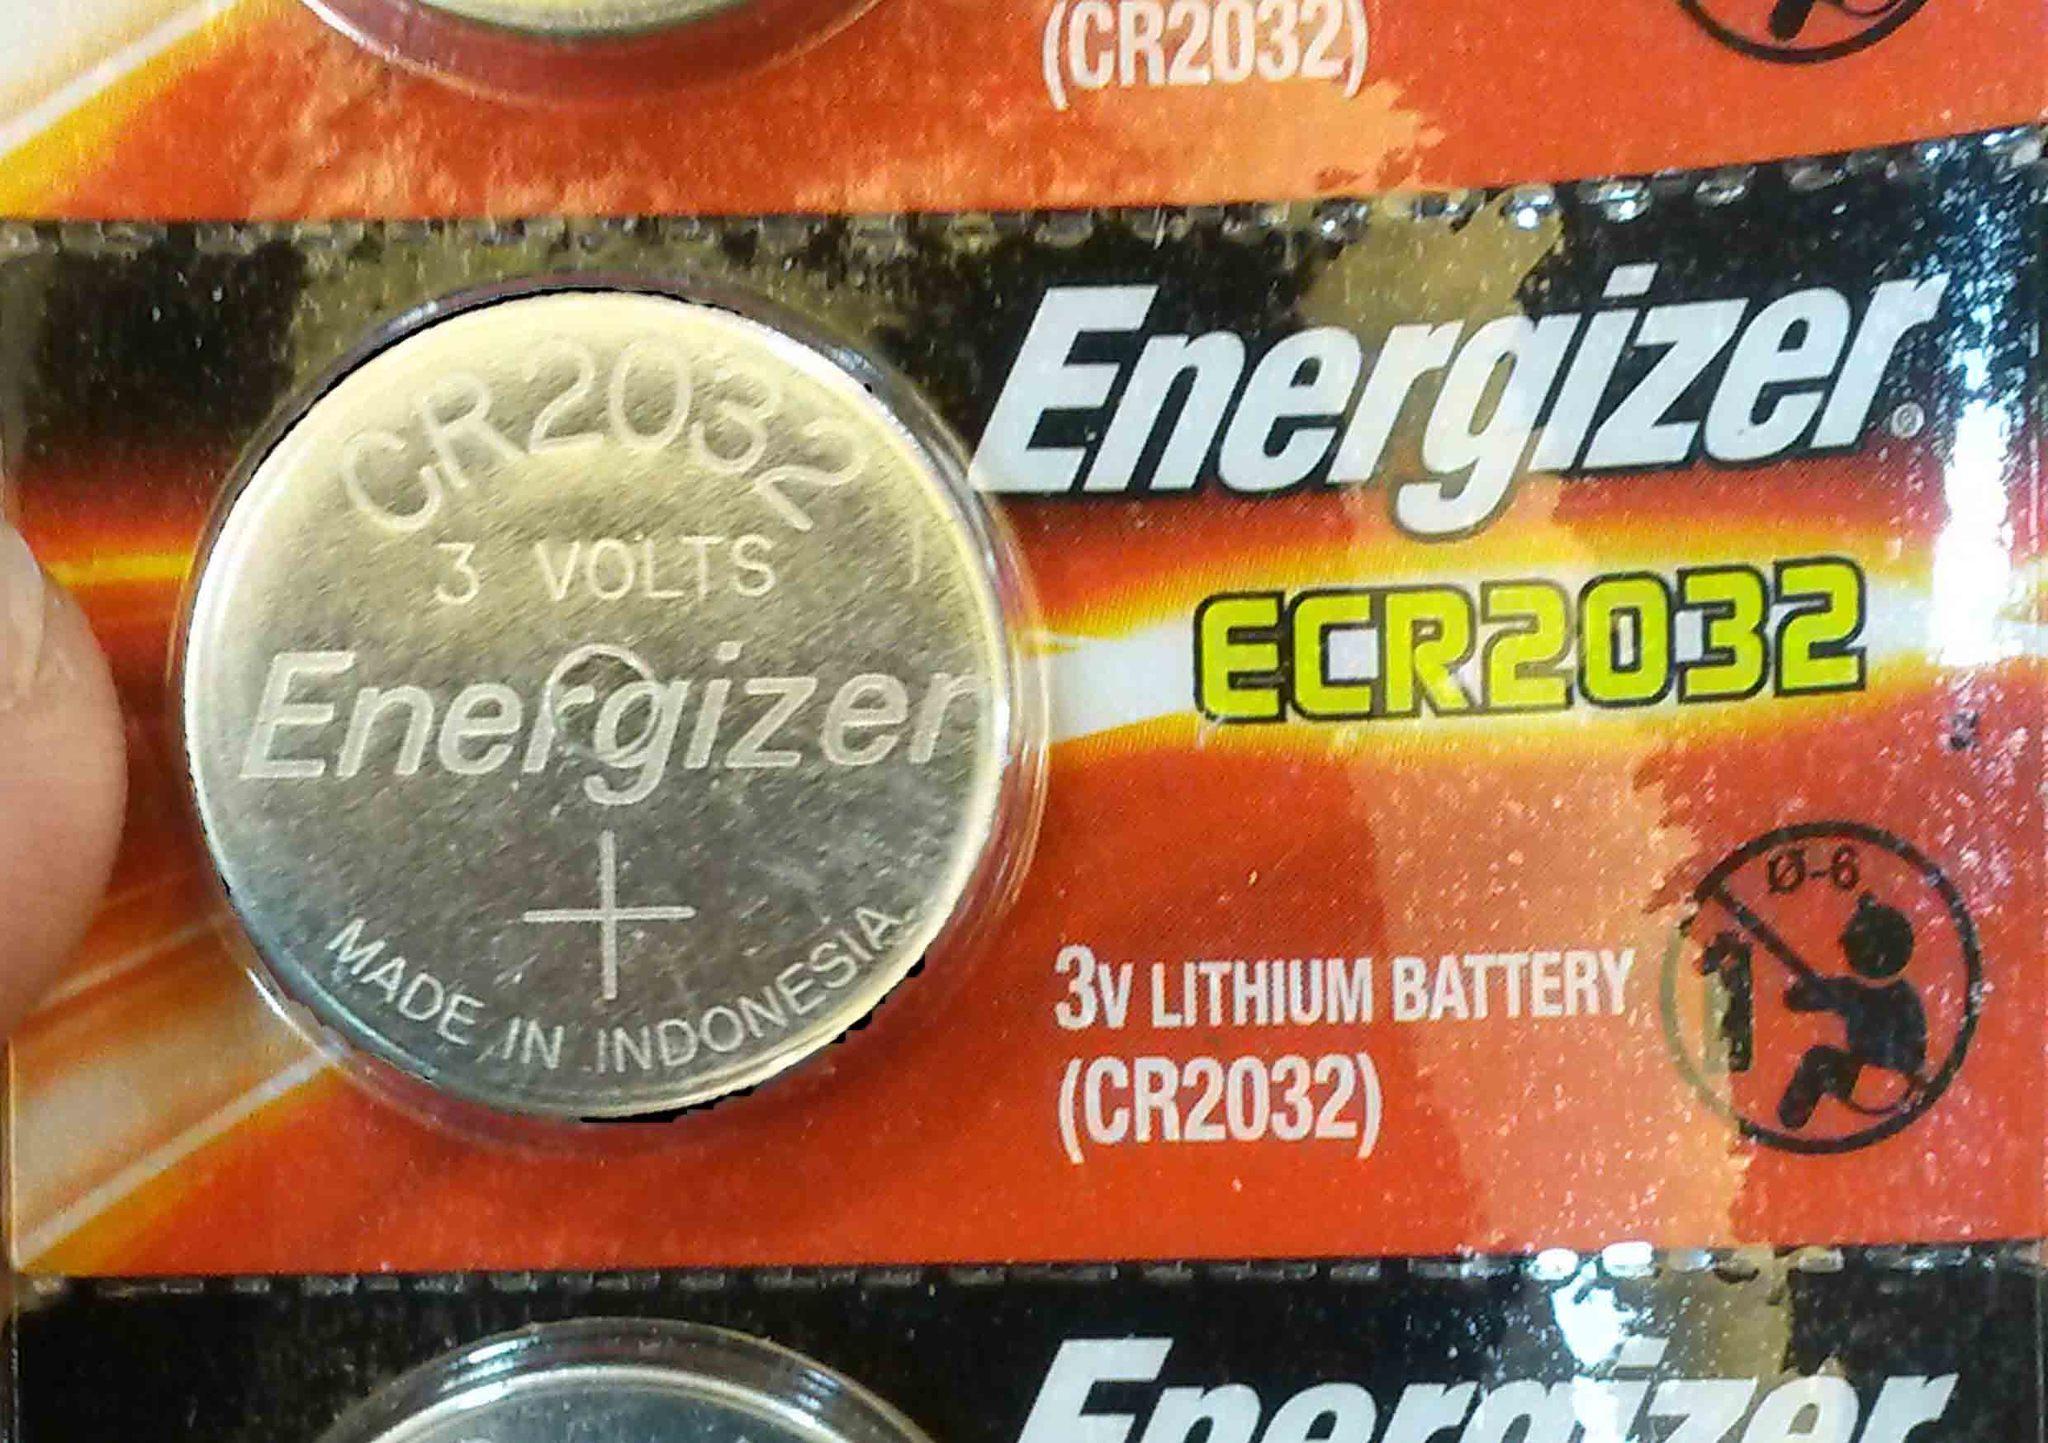 Jual Baterai Battery Cmos Bios Laptop Jam Kancing Energizer Cr2032 Batre Ori Asli Tokonick Tokopedia